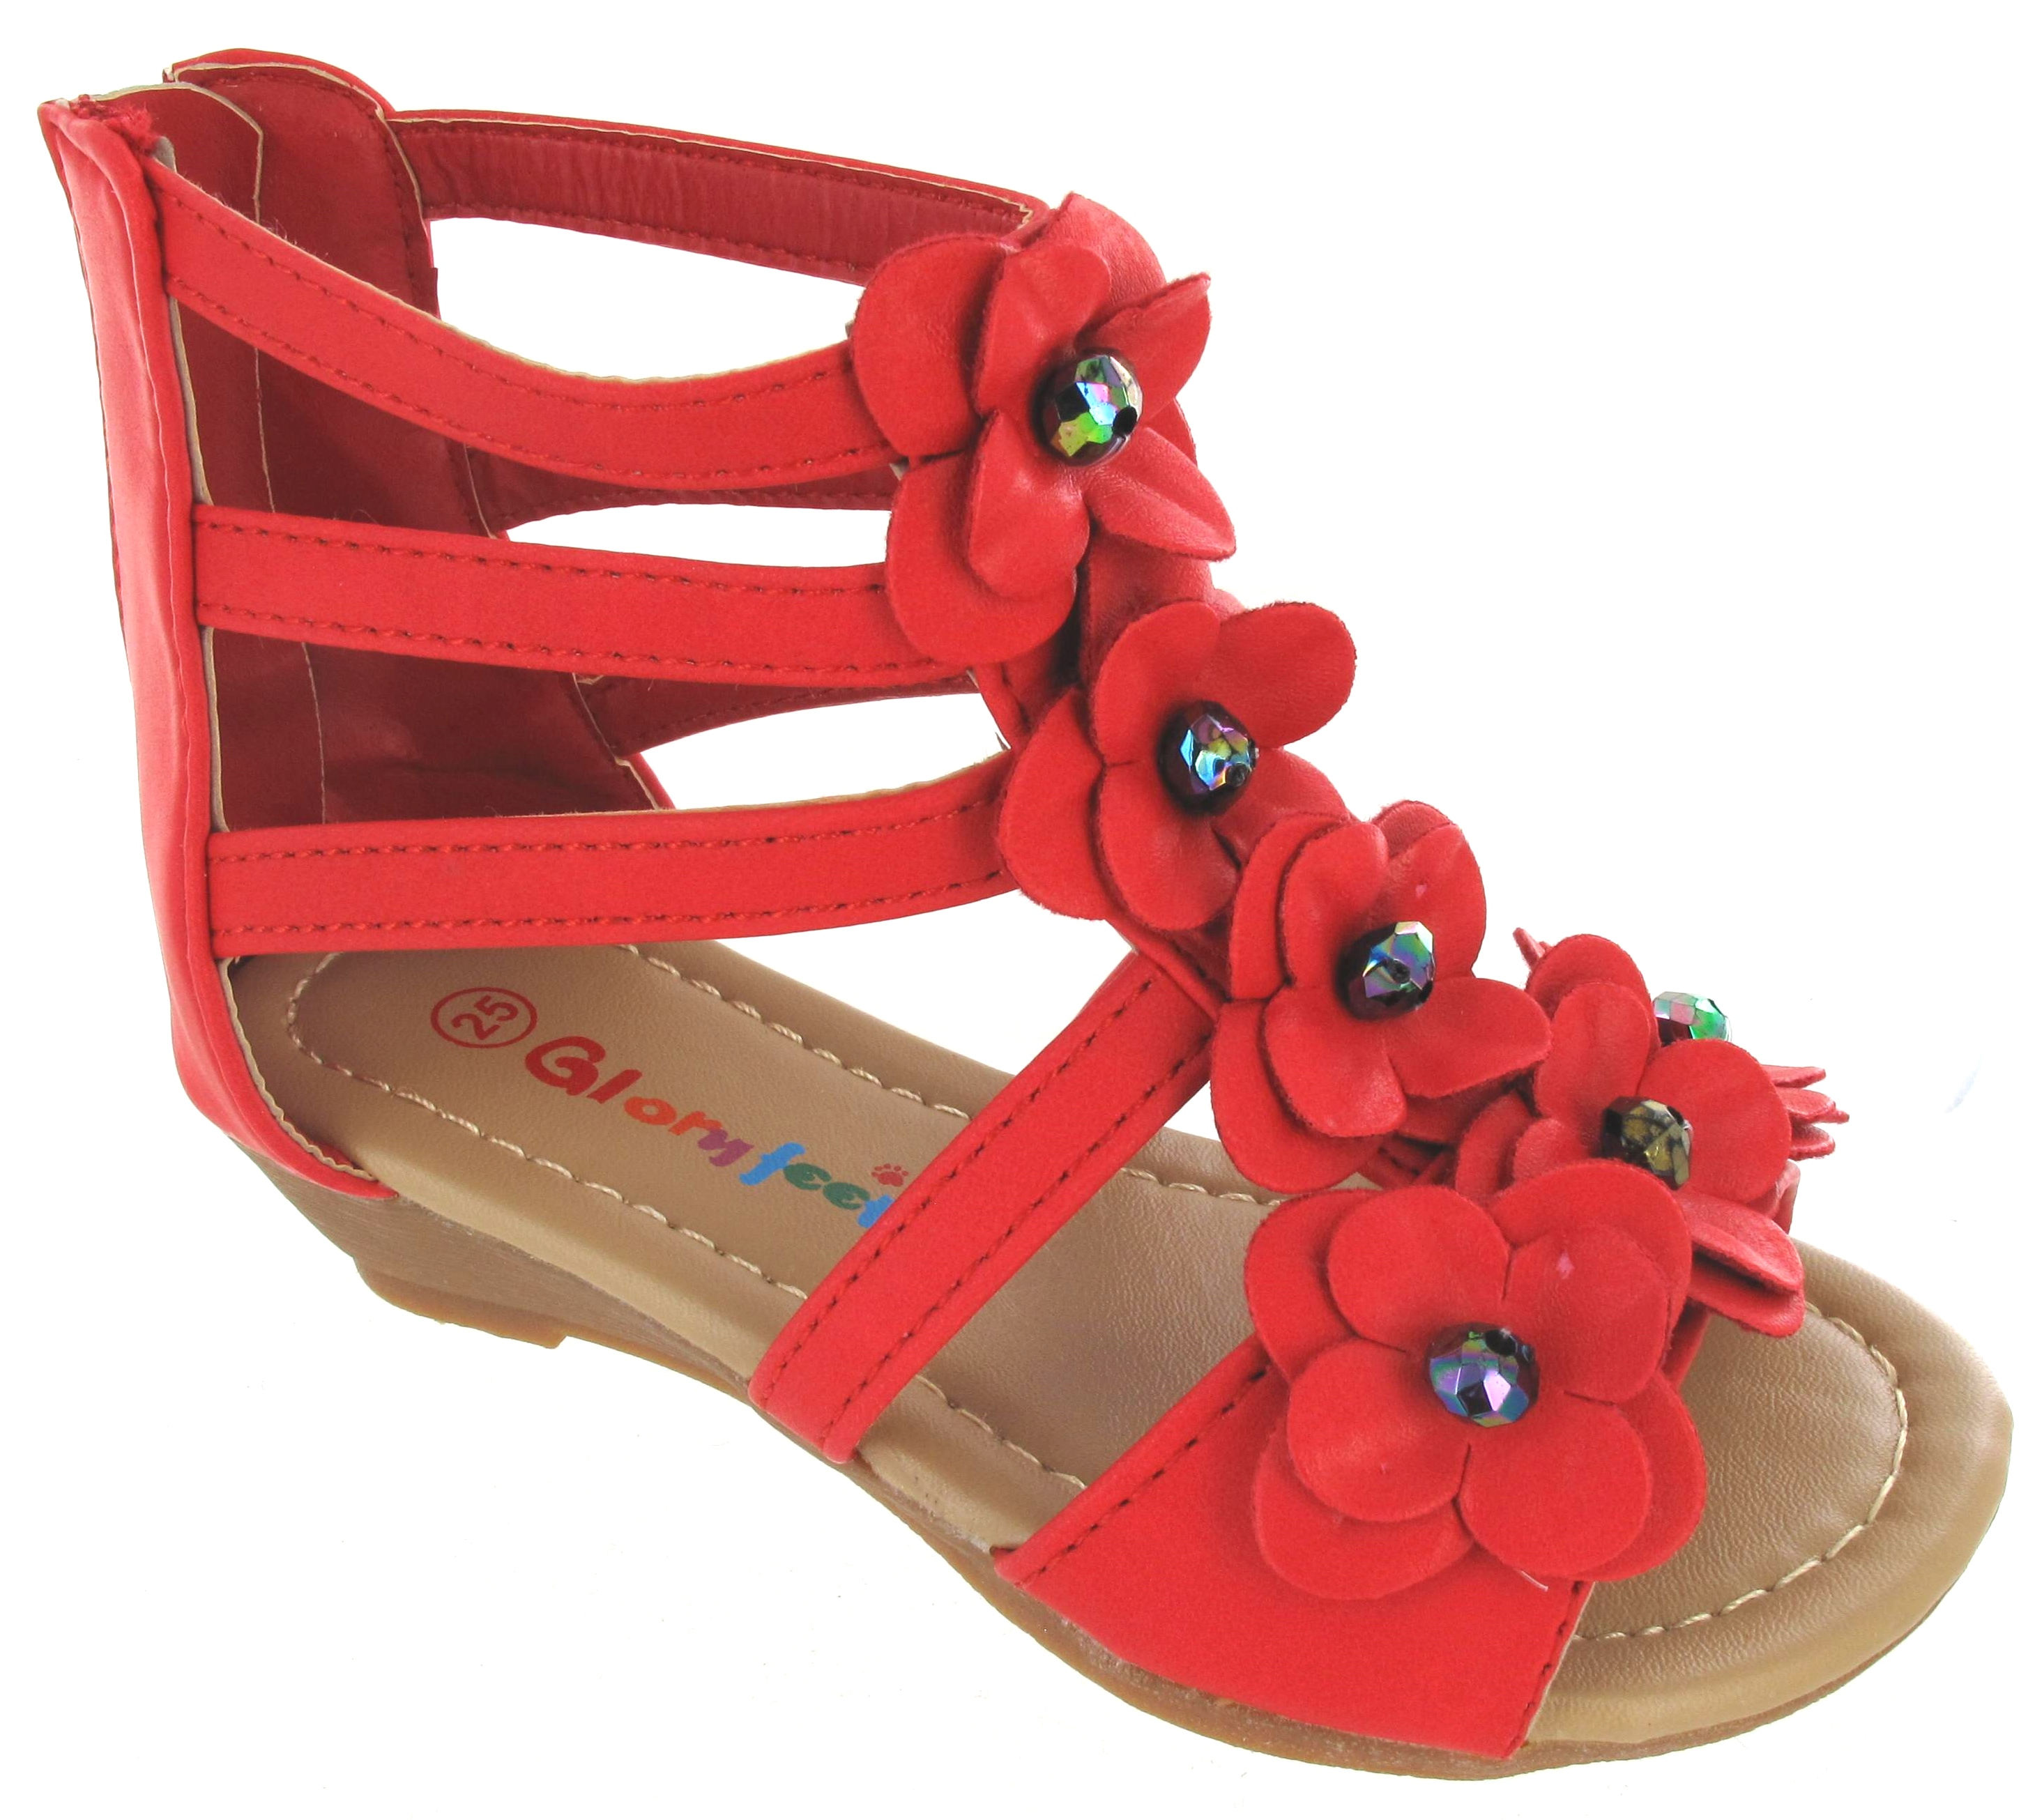 Girls sandals - Girls Sandals Kids Infants Toddlers Summer Walking Flower Beach Shoes Size 5 2 Ebay